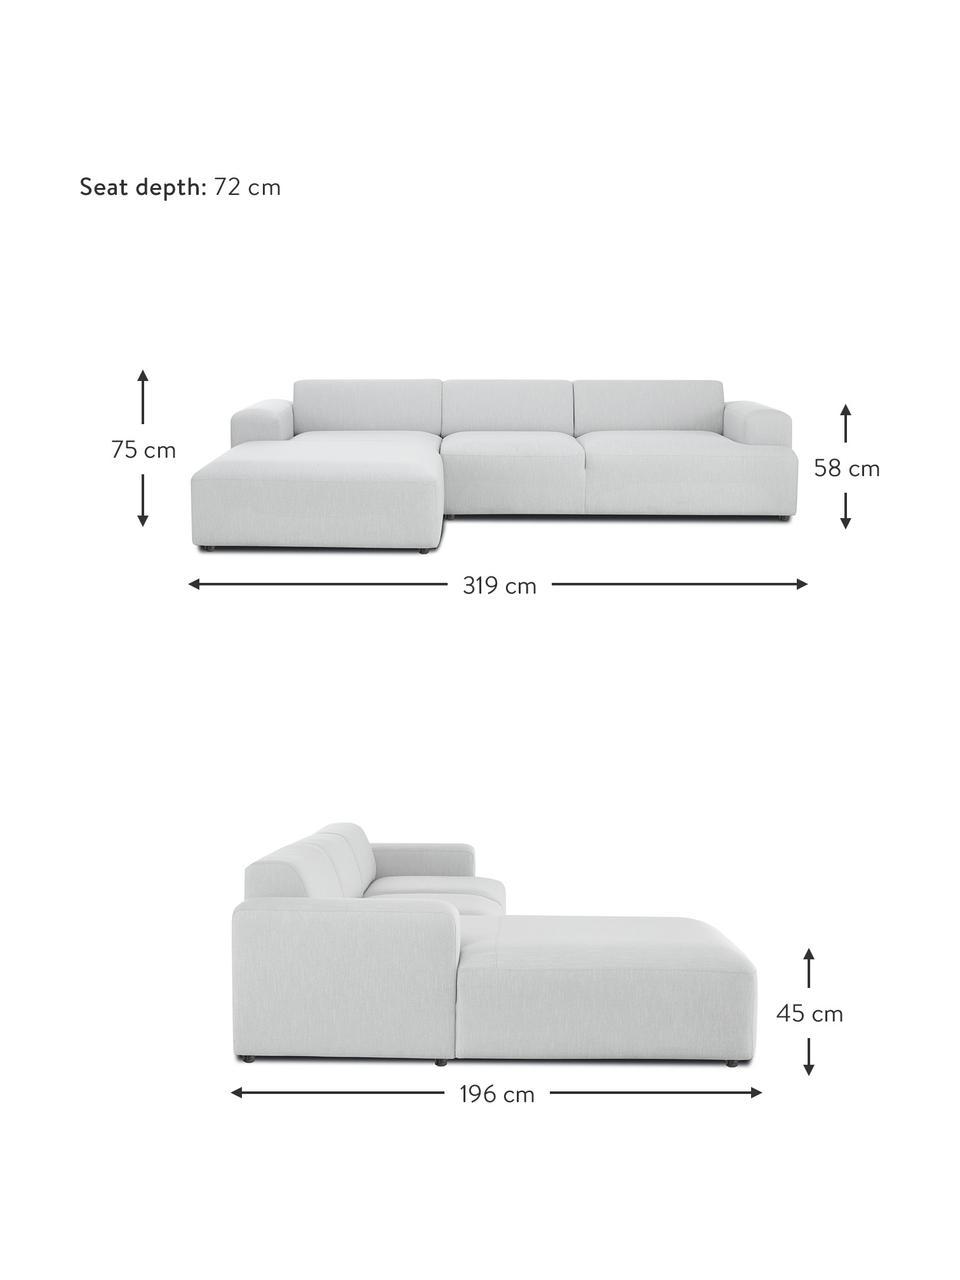 Hoekbank Melva (4-zits) in lichtgrijs, Bekleding: 100% polyester, Frame: massief grenenhout, FSC-g, Poten: kunststof, Lichtgrijs, B 319 x D 196 cm